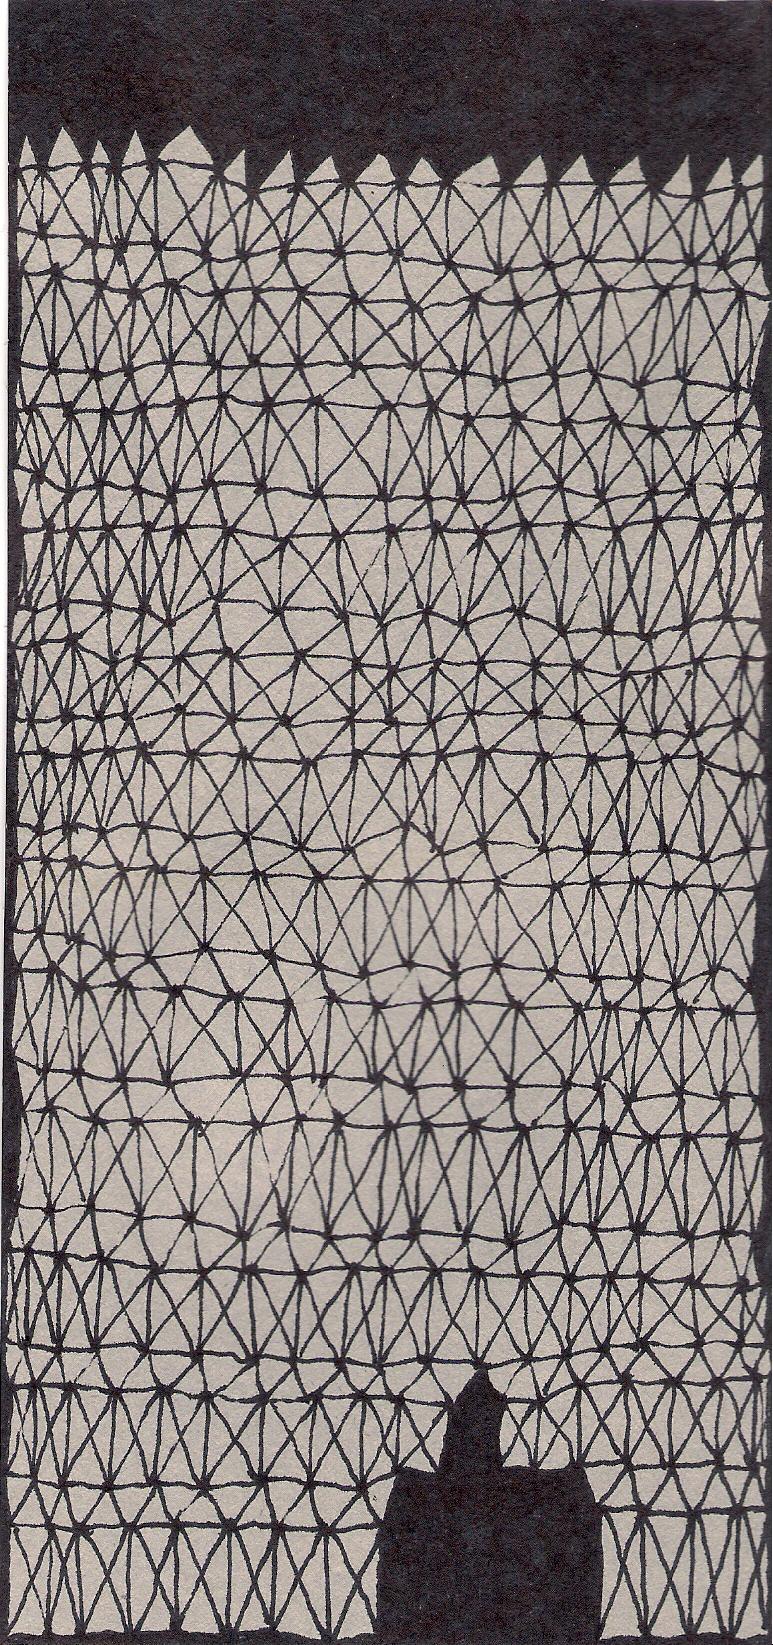 Architetture-Sospese-Cartoline-08-20,90×9,75